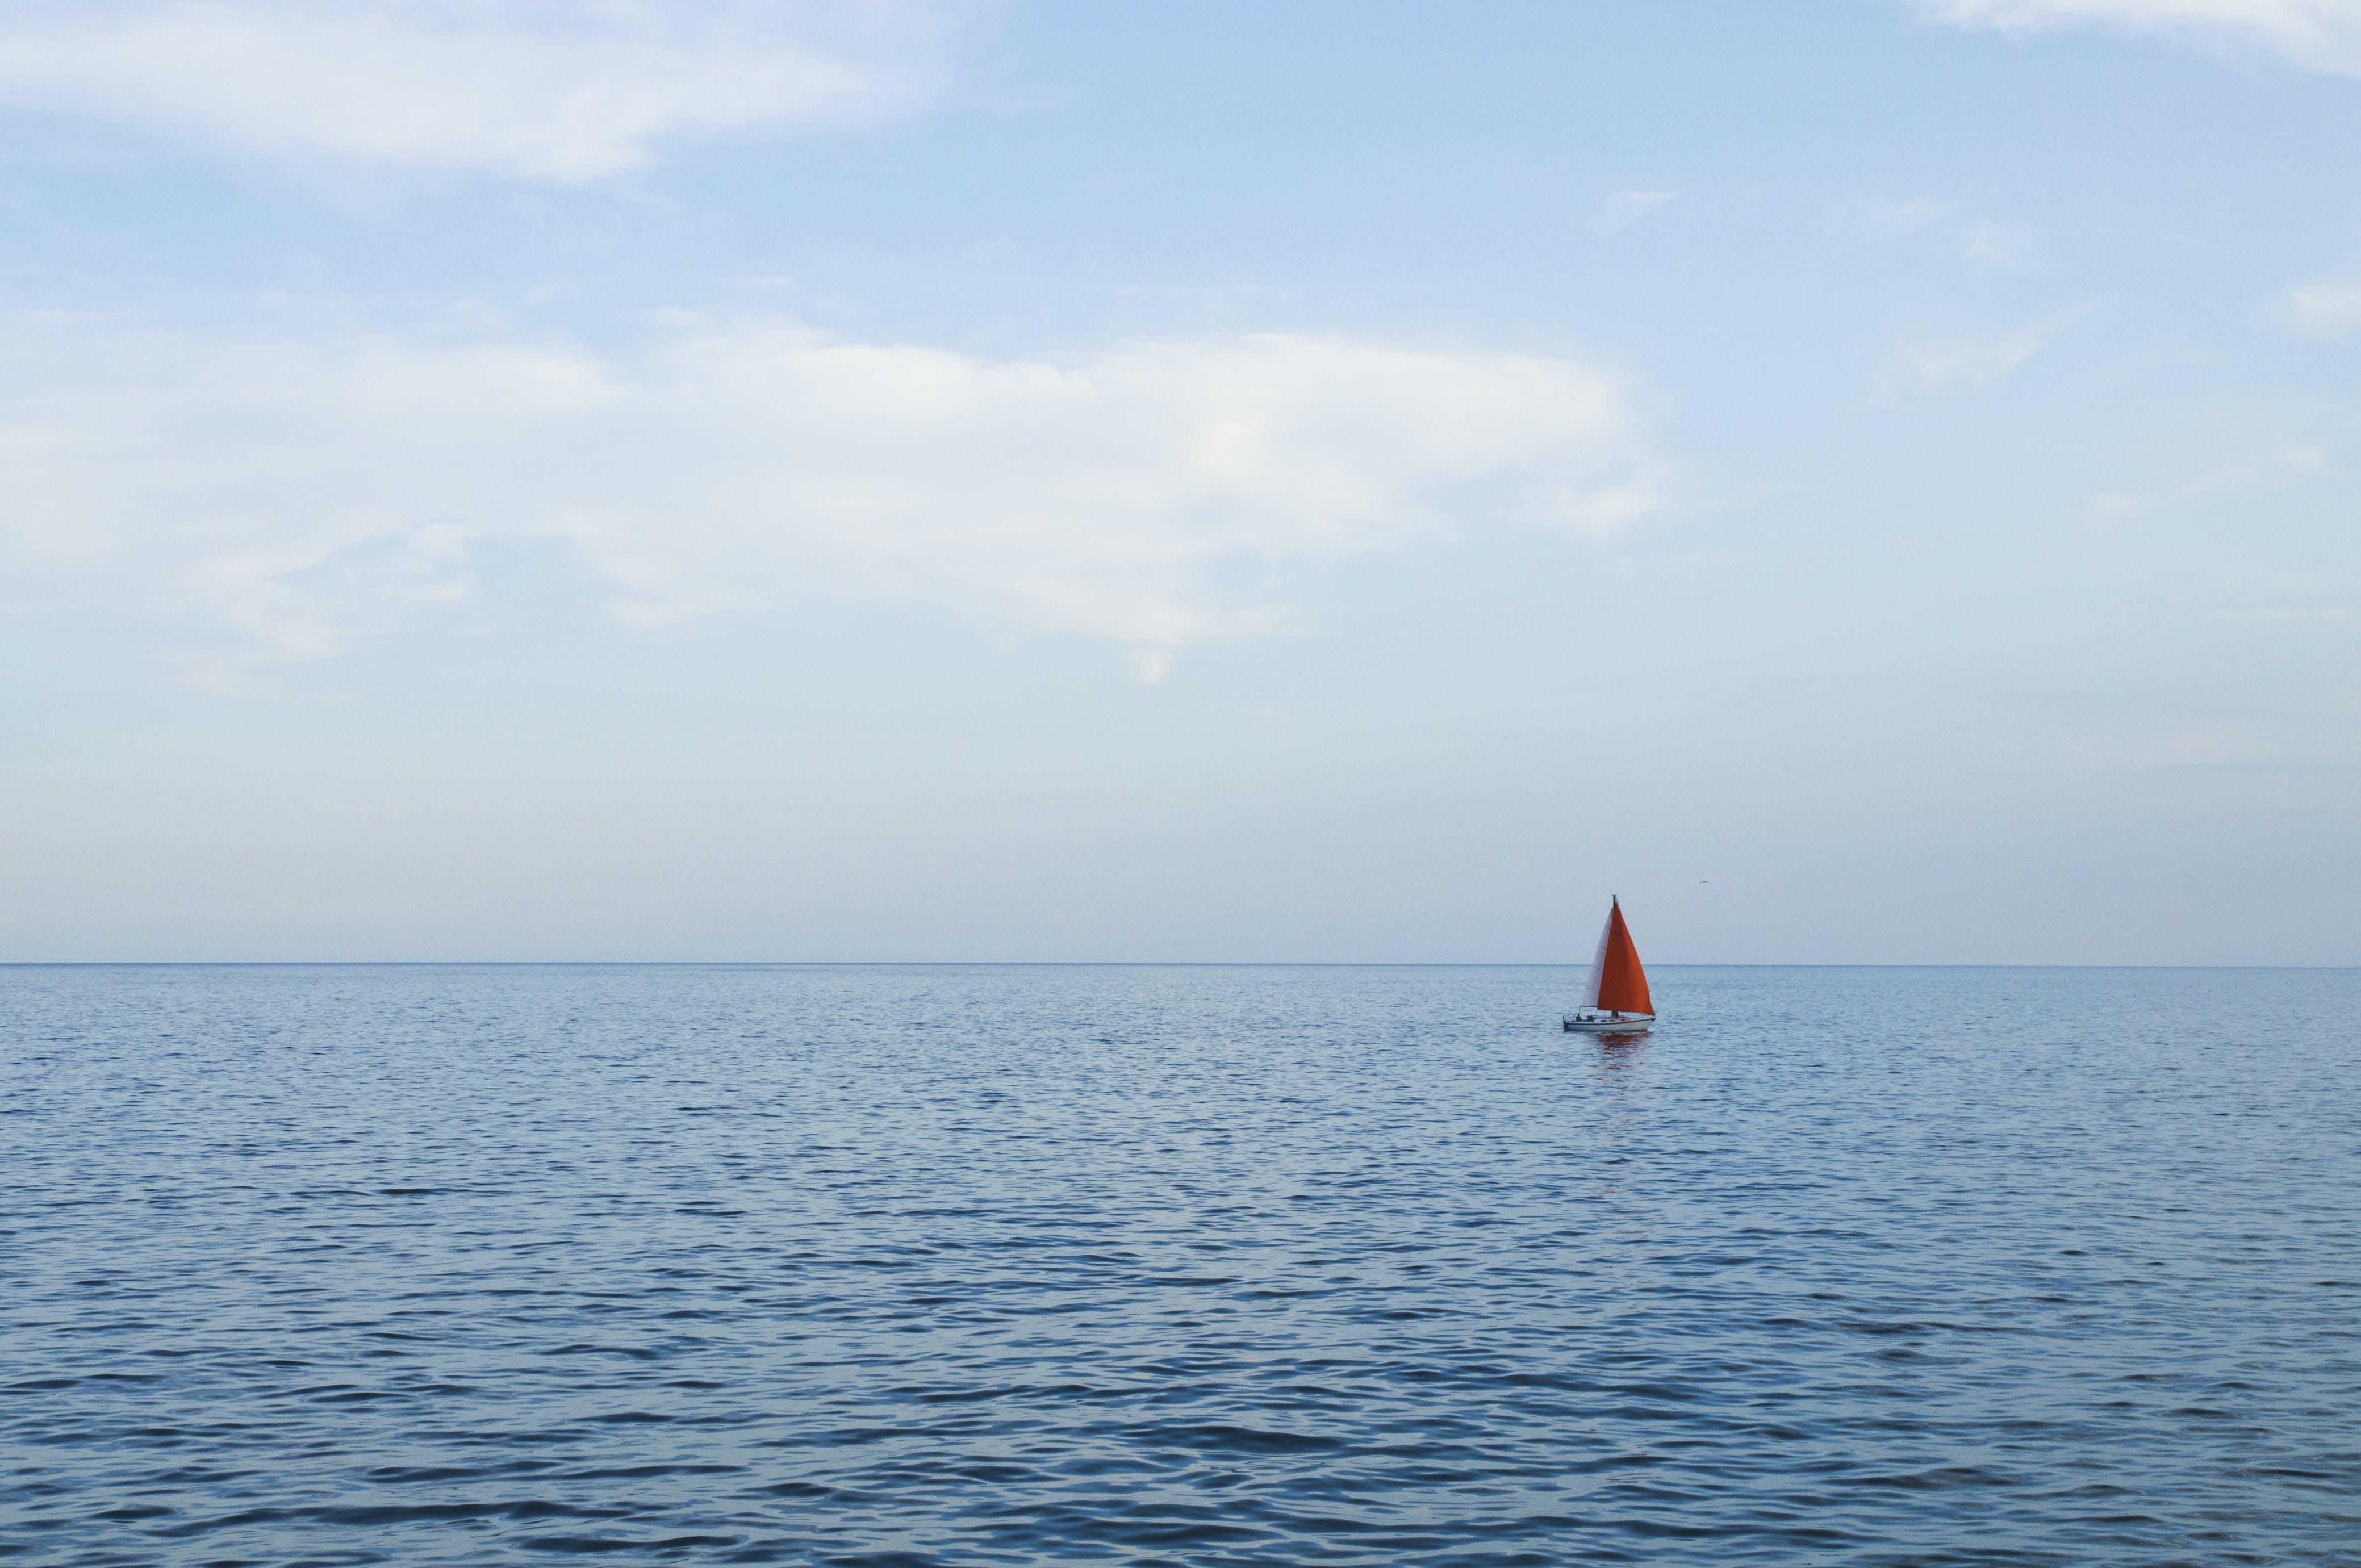 Orange Sailboat on Body of Water